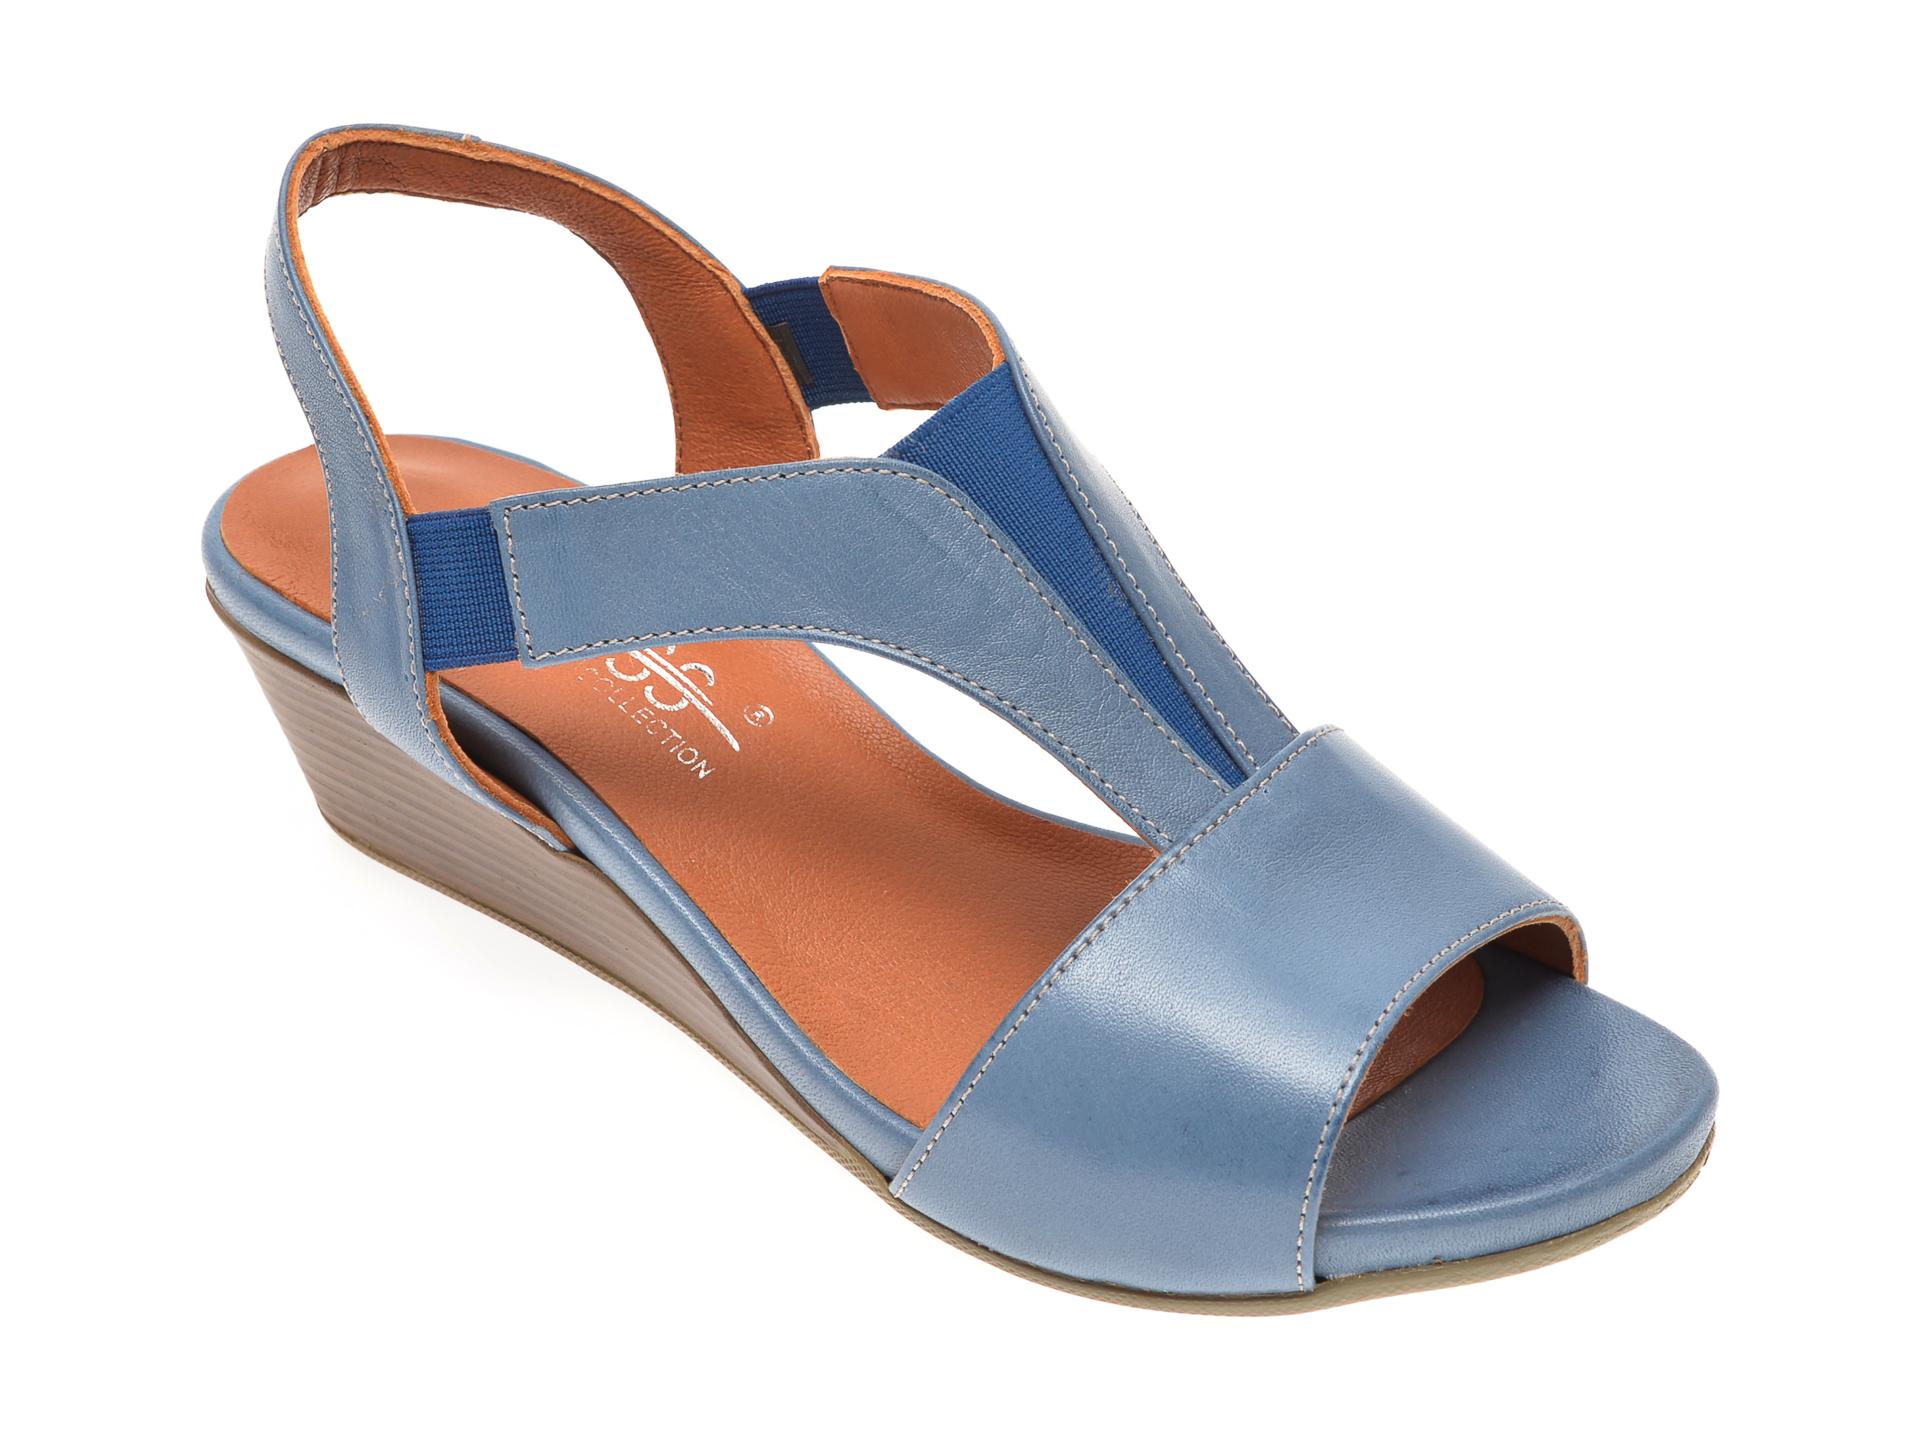 Sandale PASS COLLECTION albastre, 6073, din piele naturala